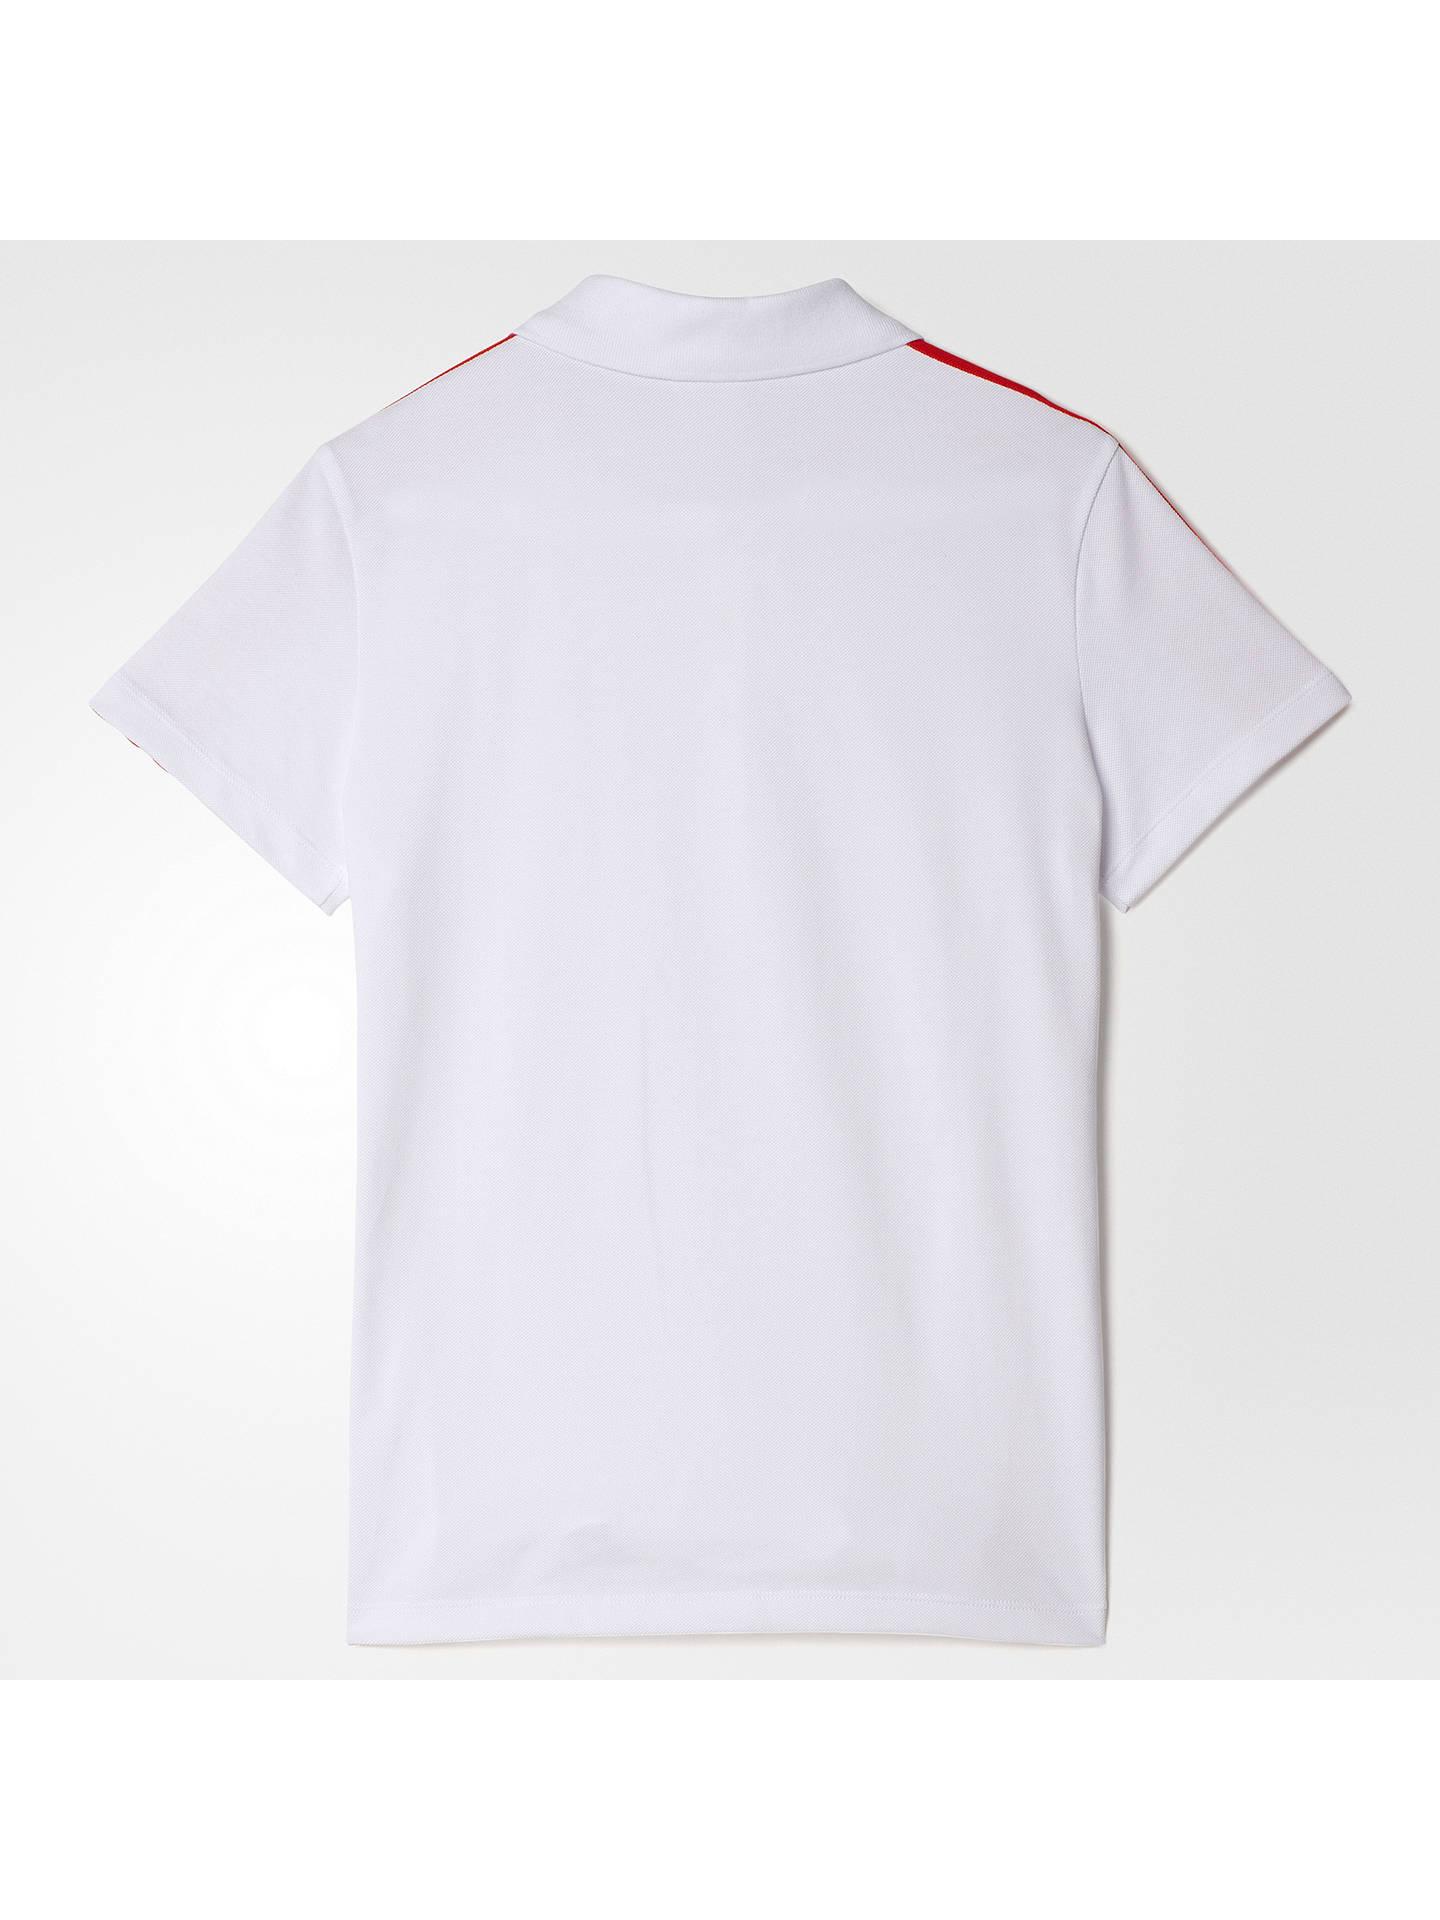 adidas polo t shirt malaysia